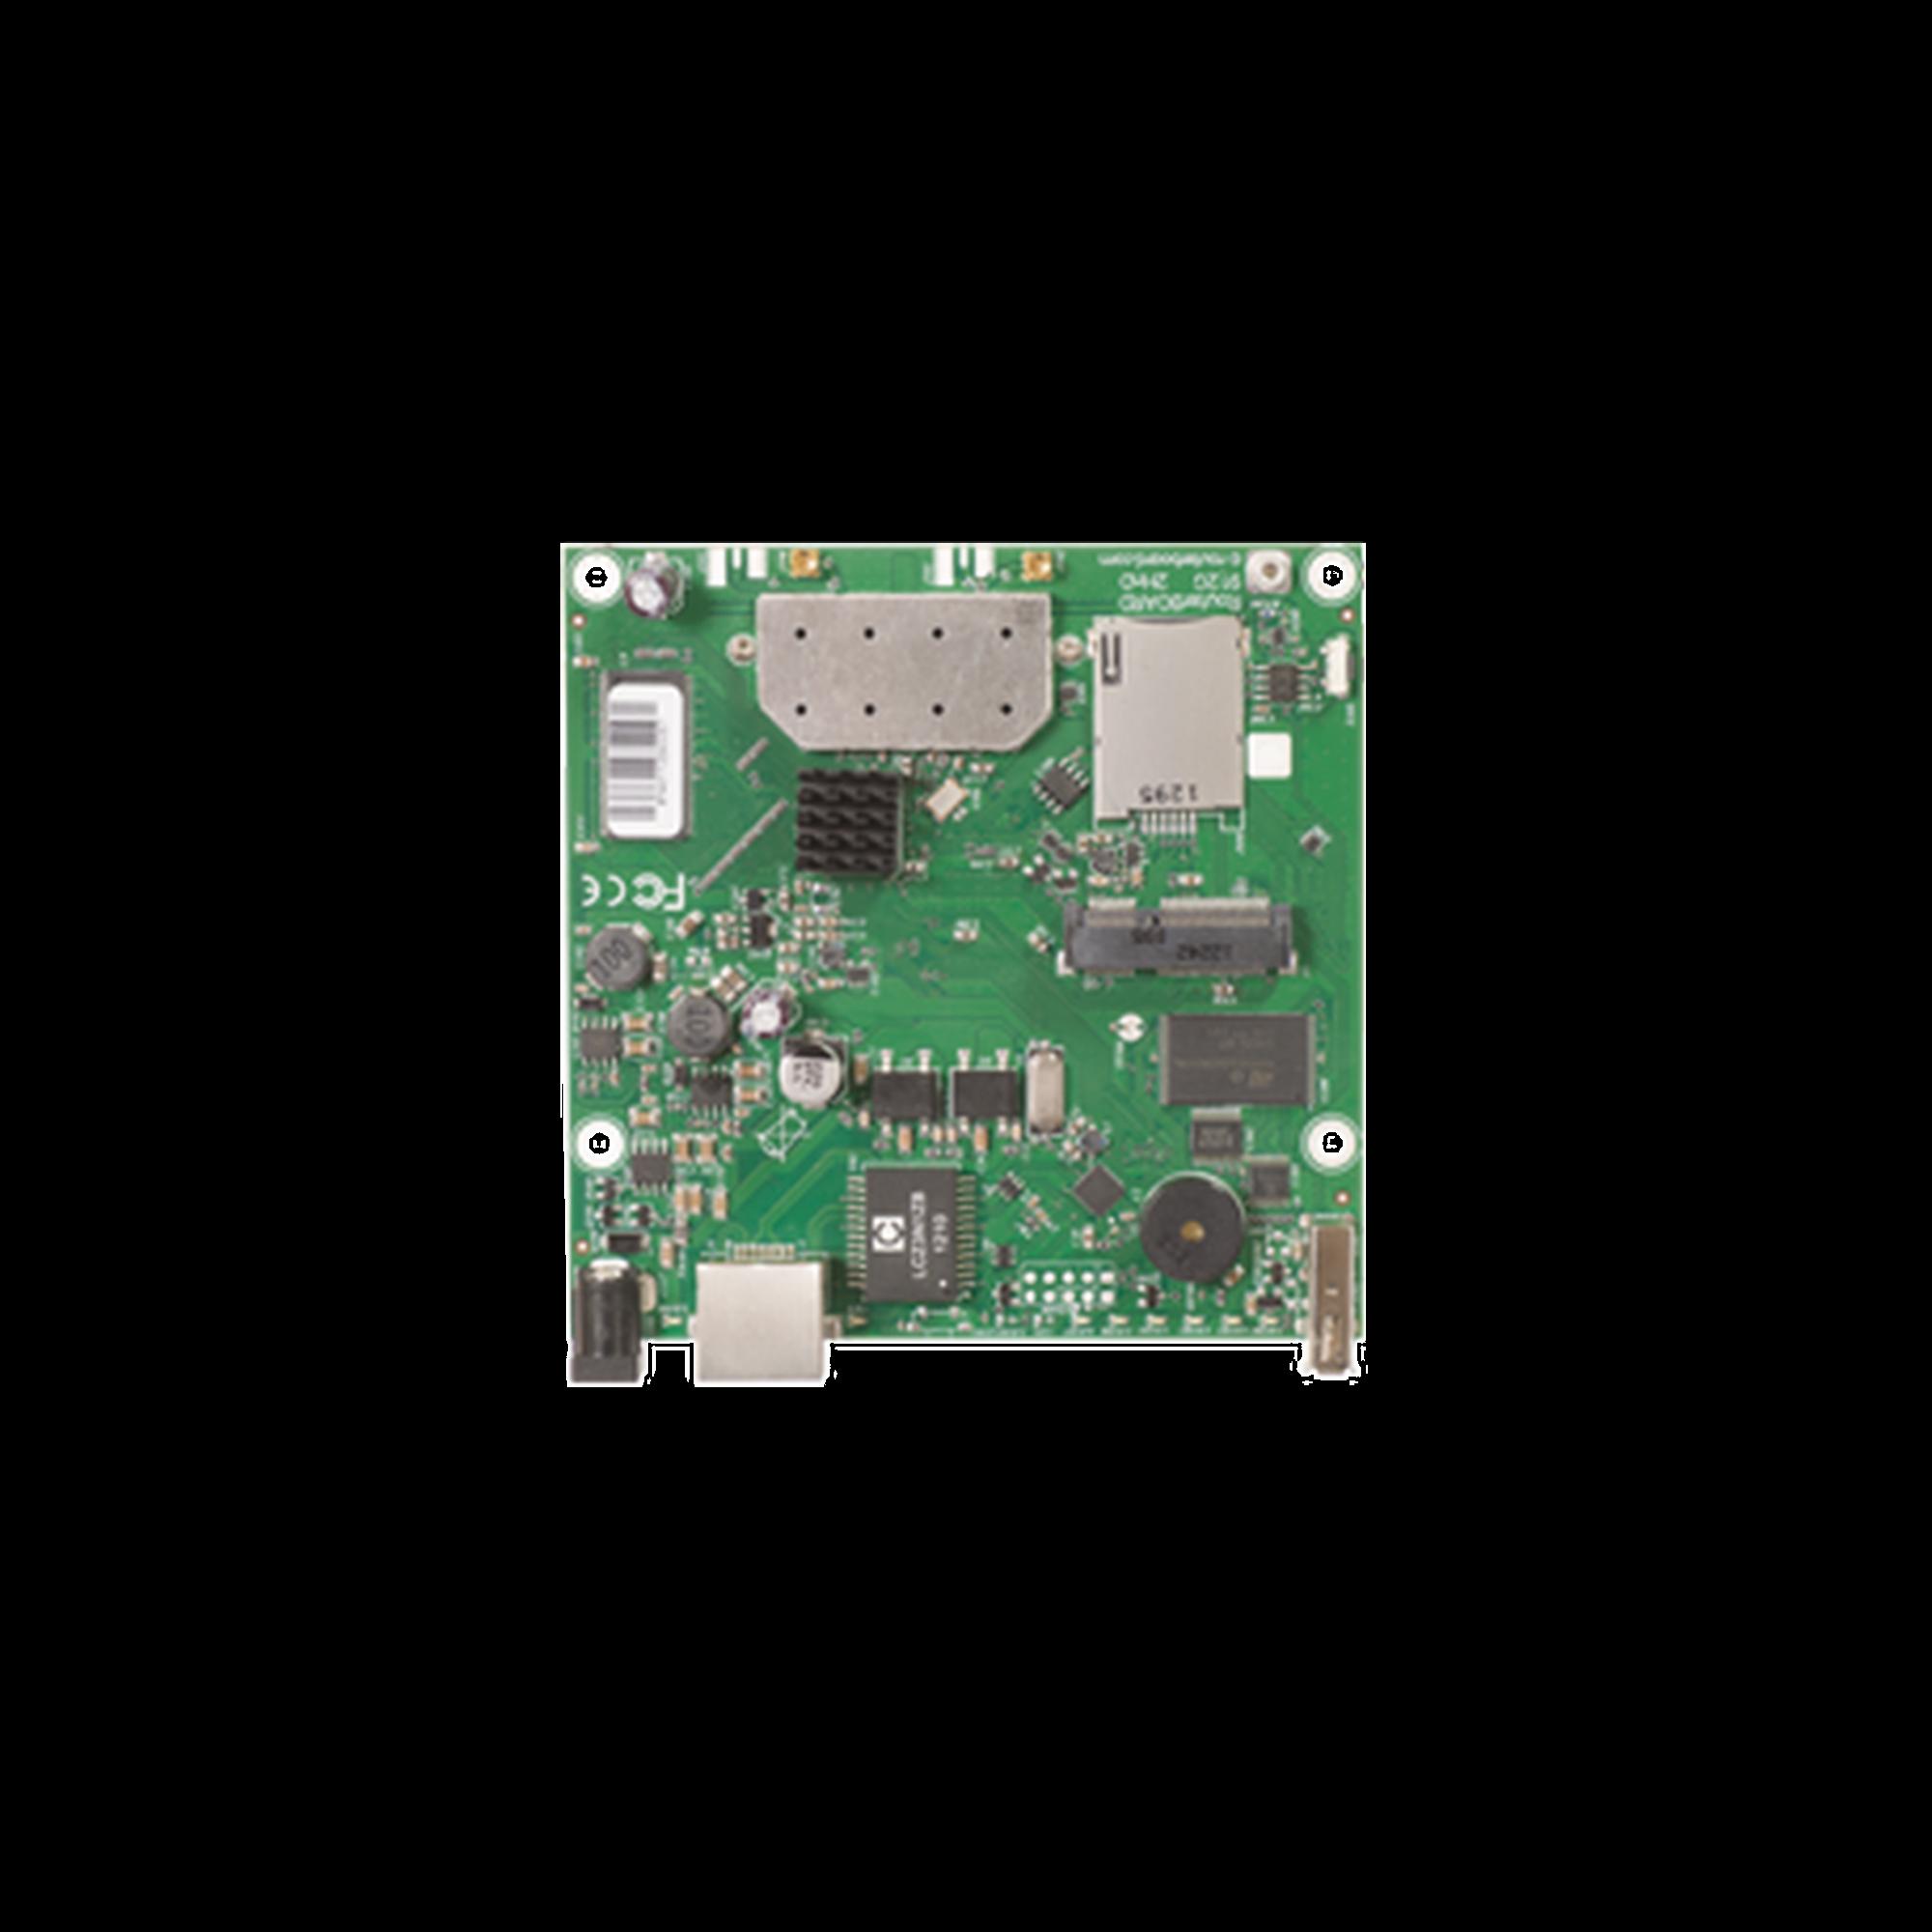 Tarjeta Inalámbrica y router en 2.4 GHz 802.11 b/g/n,  64 MB de RAM, 1 Puerto Gigabit Ethernet, Nivel de Licencia 4